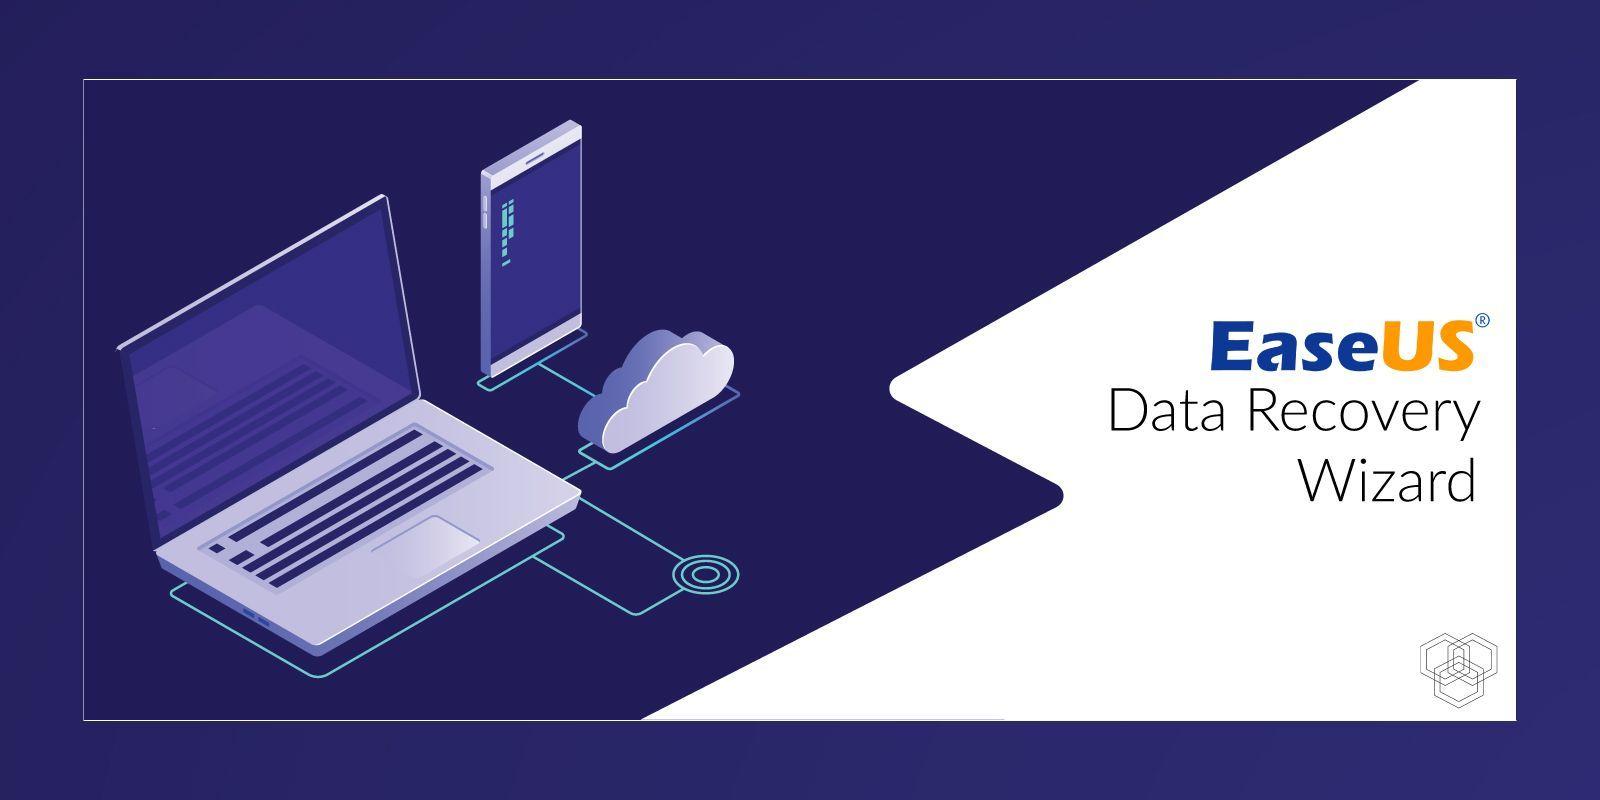 Revisión del asistente de restauración de datos de EaseUS